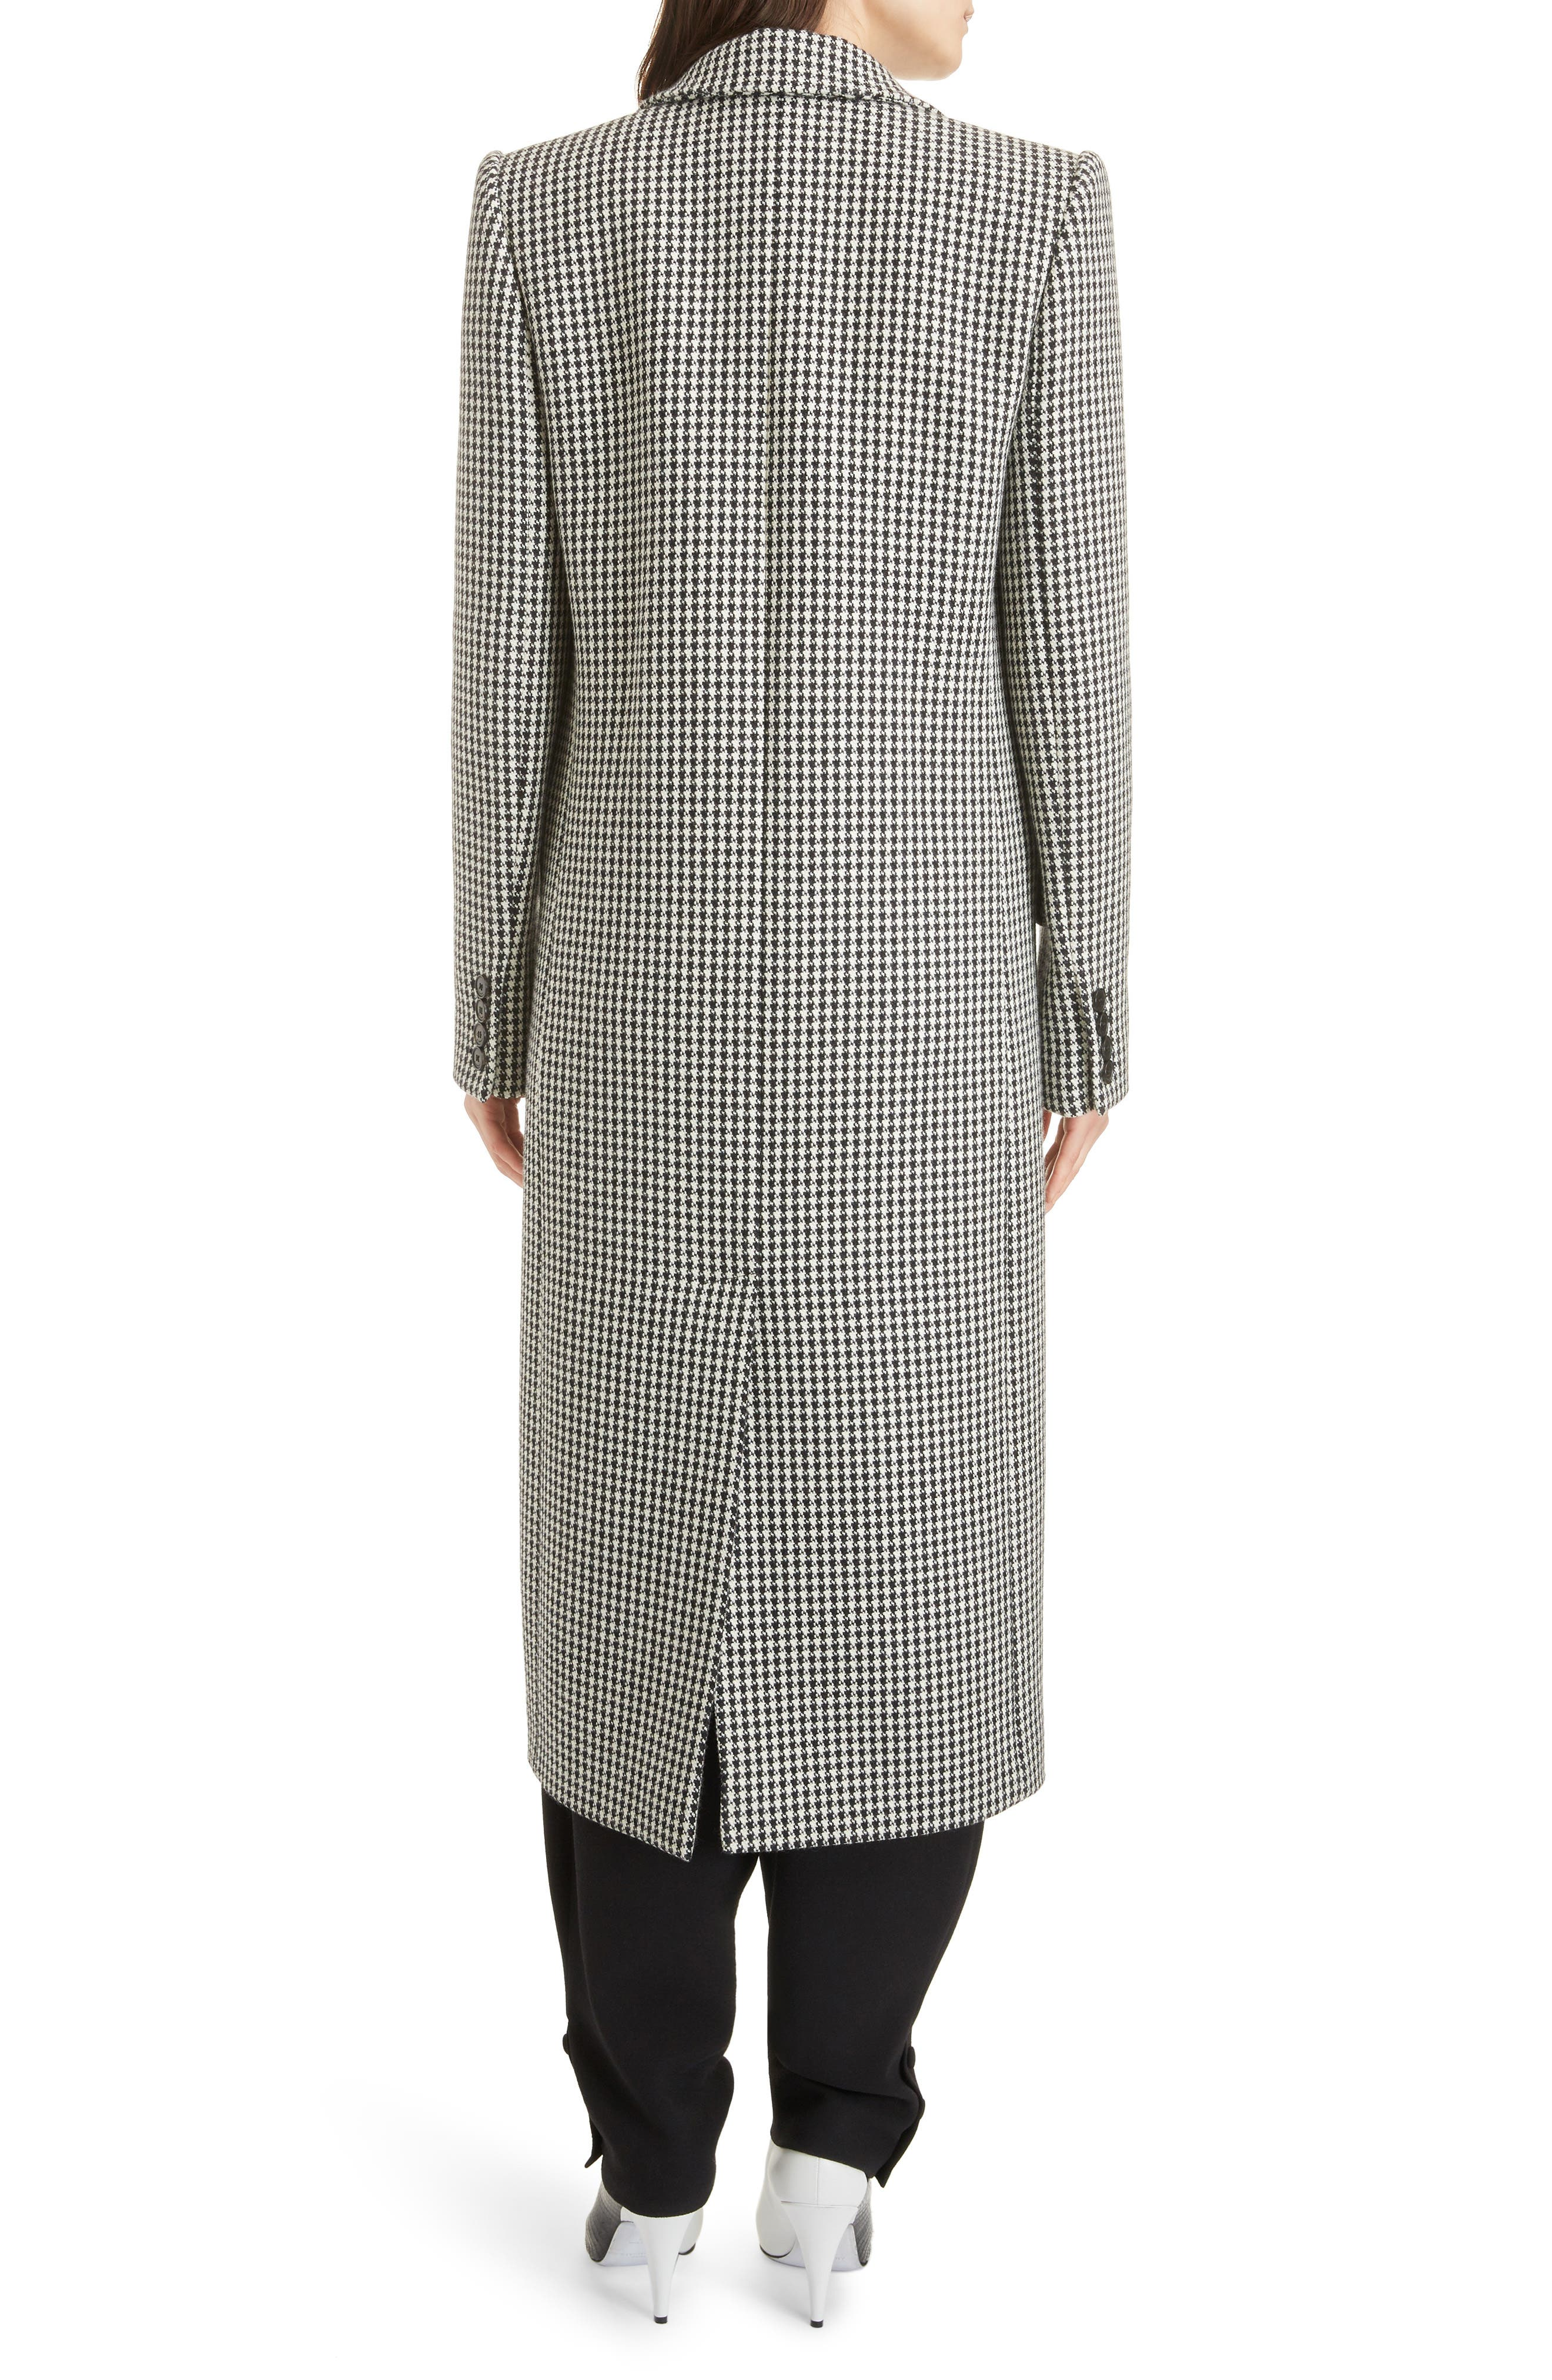 Houndstooth Wool Coat,                             Alternate thumbnail 2, color,                             BLACK NATURAL